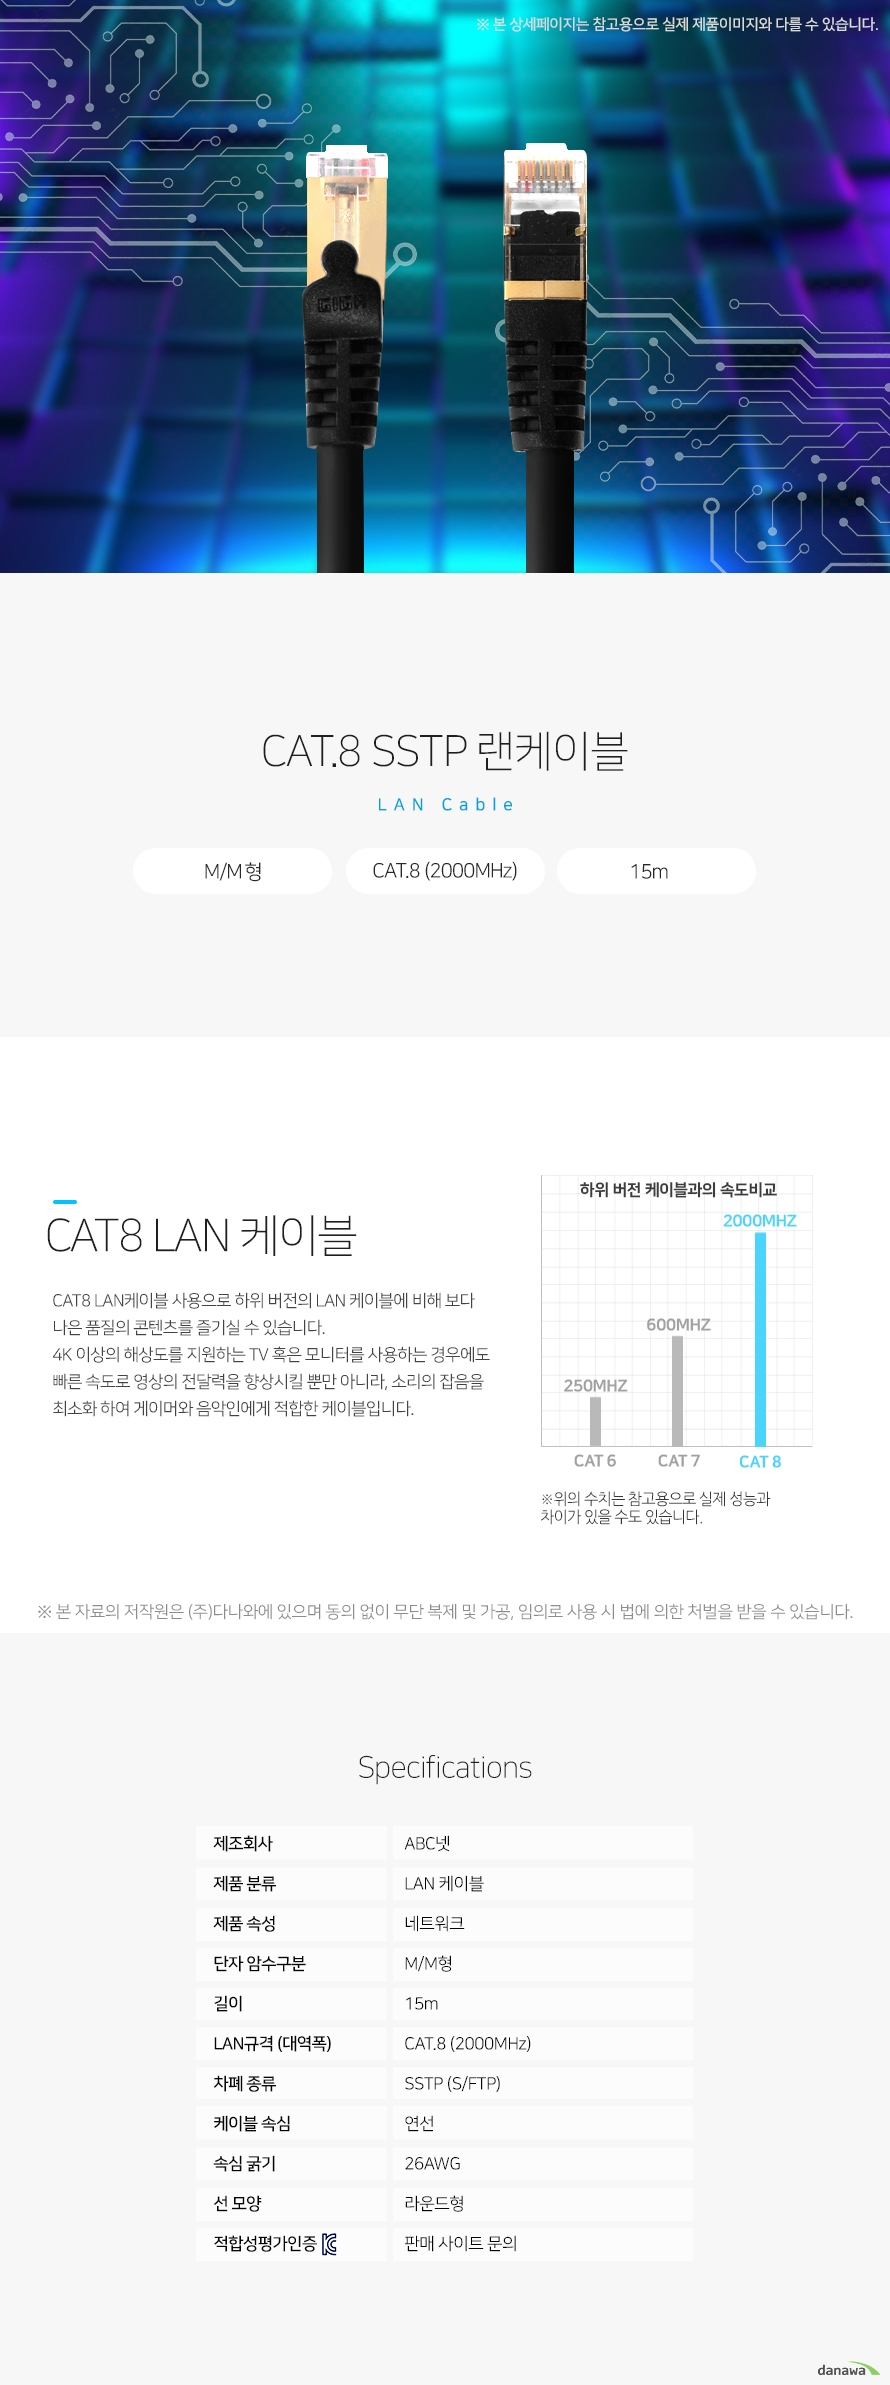 ABC넷 CAT.8 SSTP 랜케이블 (15m) 상세 스펙 LAN 케이블 / 네트워크 / M/M형 / CAT.8 (2000MHz) / SSTP (S/FTP) / 연선 / 26AWG / 라운드형 / RJ45 / RJ45